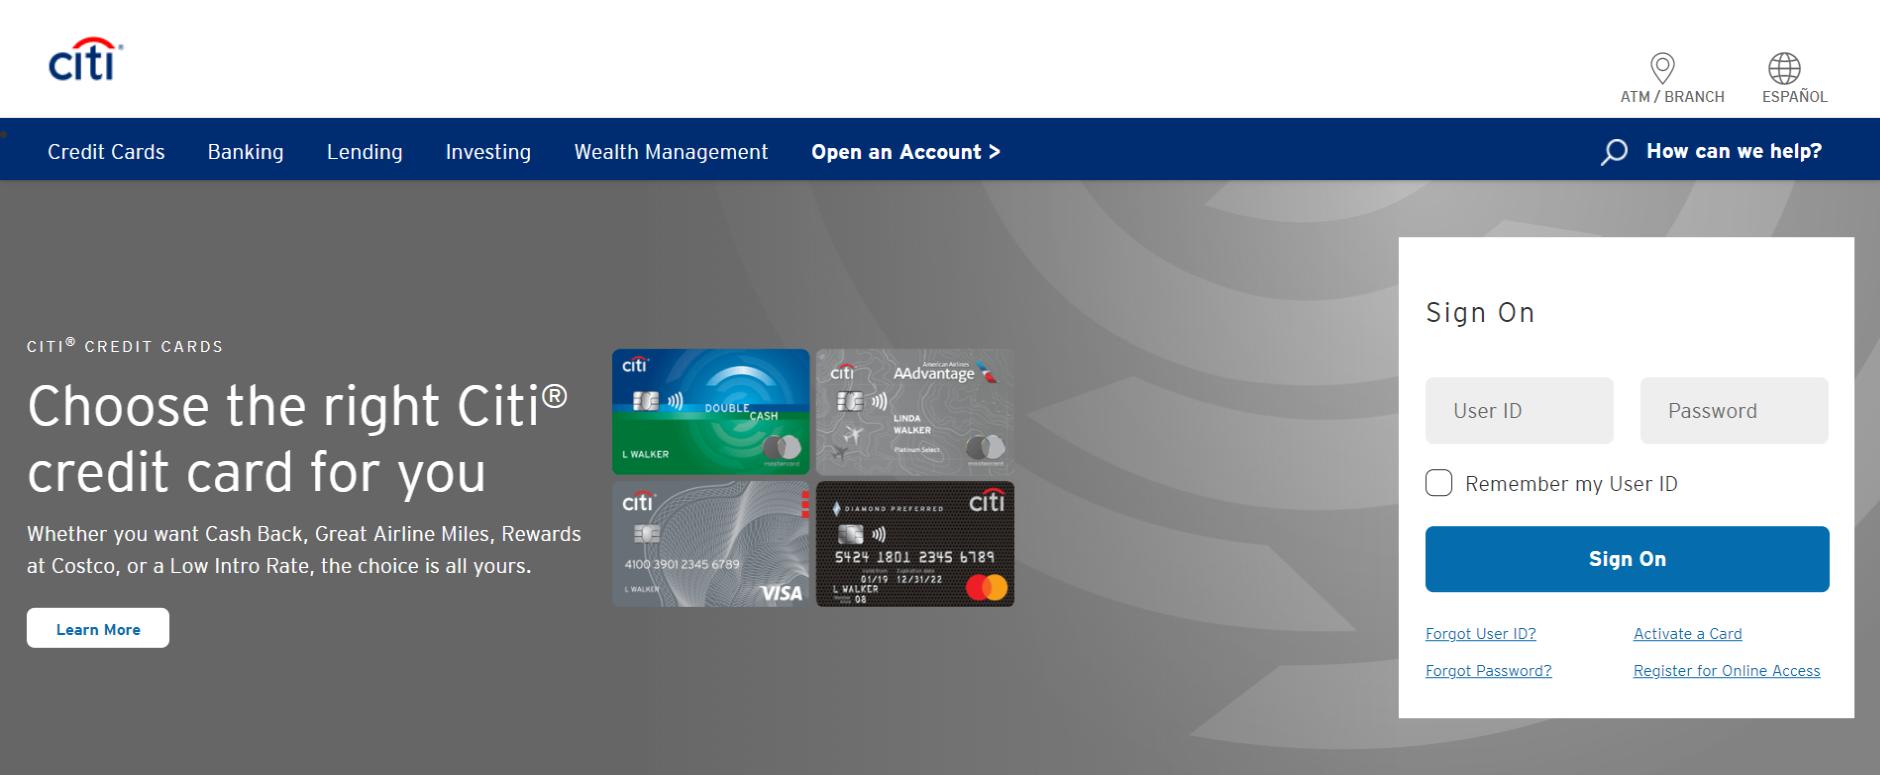 Citi credit card activation